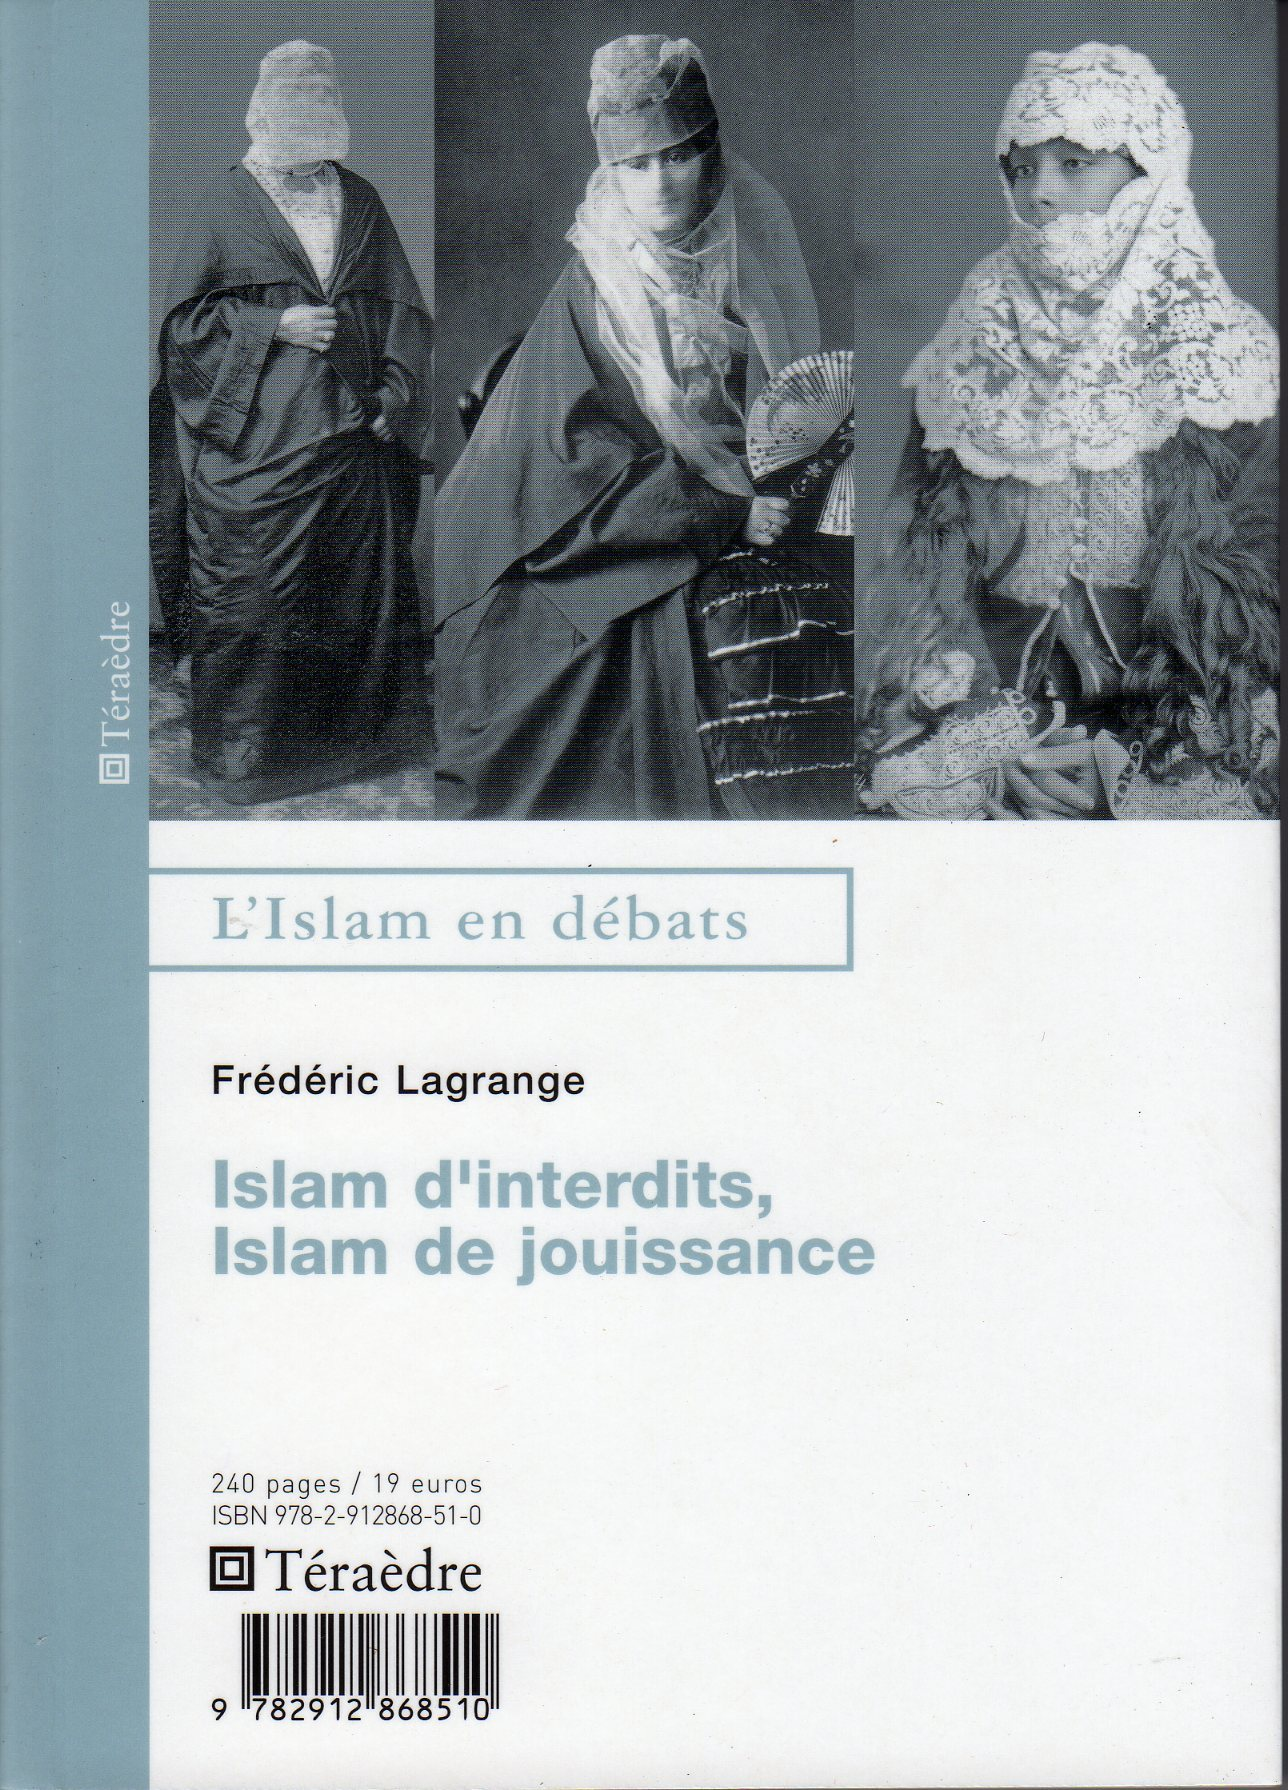 ISLAM D'INTERDITS ISLAM DE JOUISSANCE